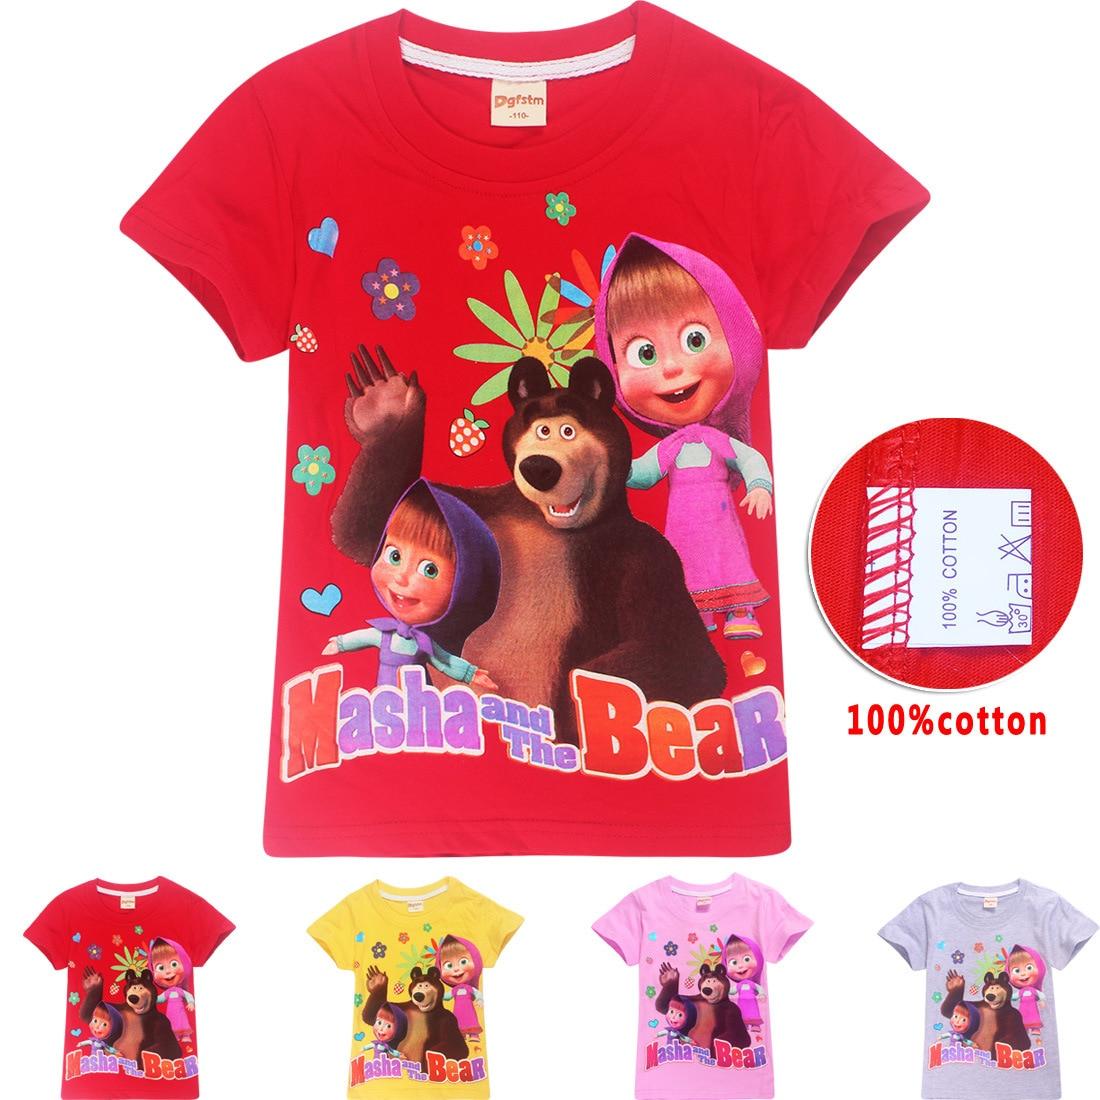 roblox cotton Russia T-shirt Bear Shirts Tshirt Clothes Tees Tops Men T shirt 2018 boys clothes girl dress baby girl clothes